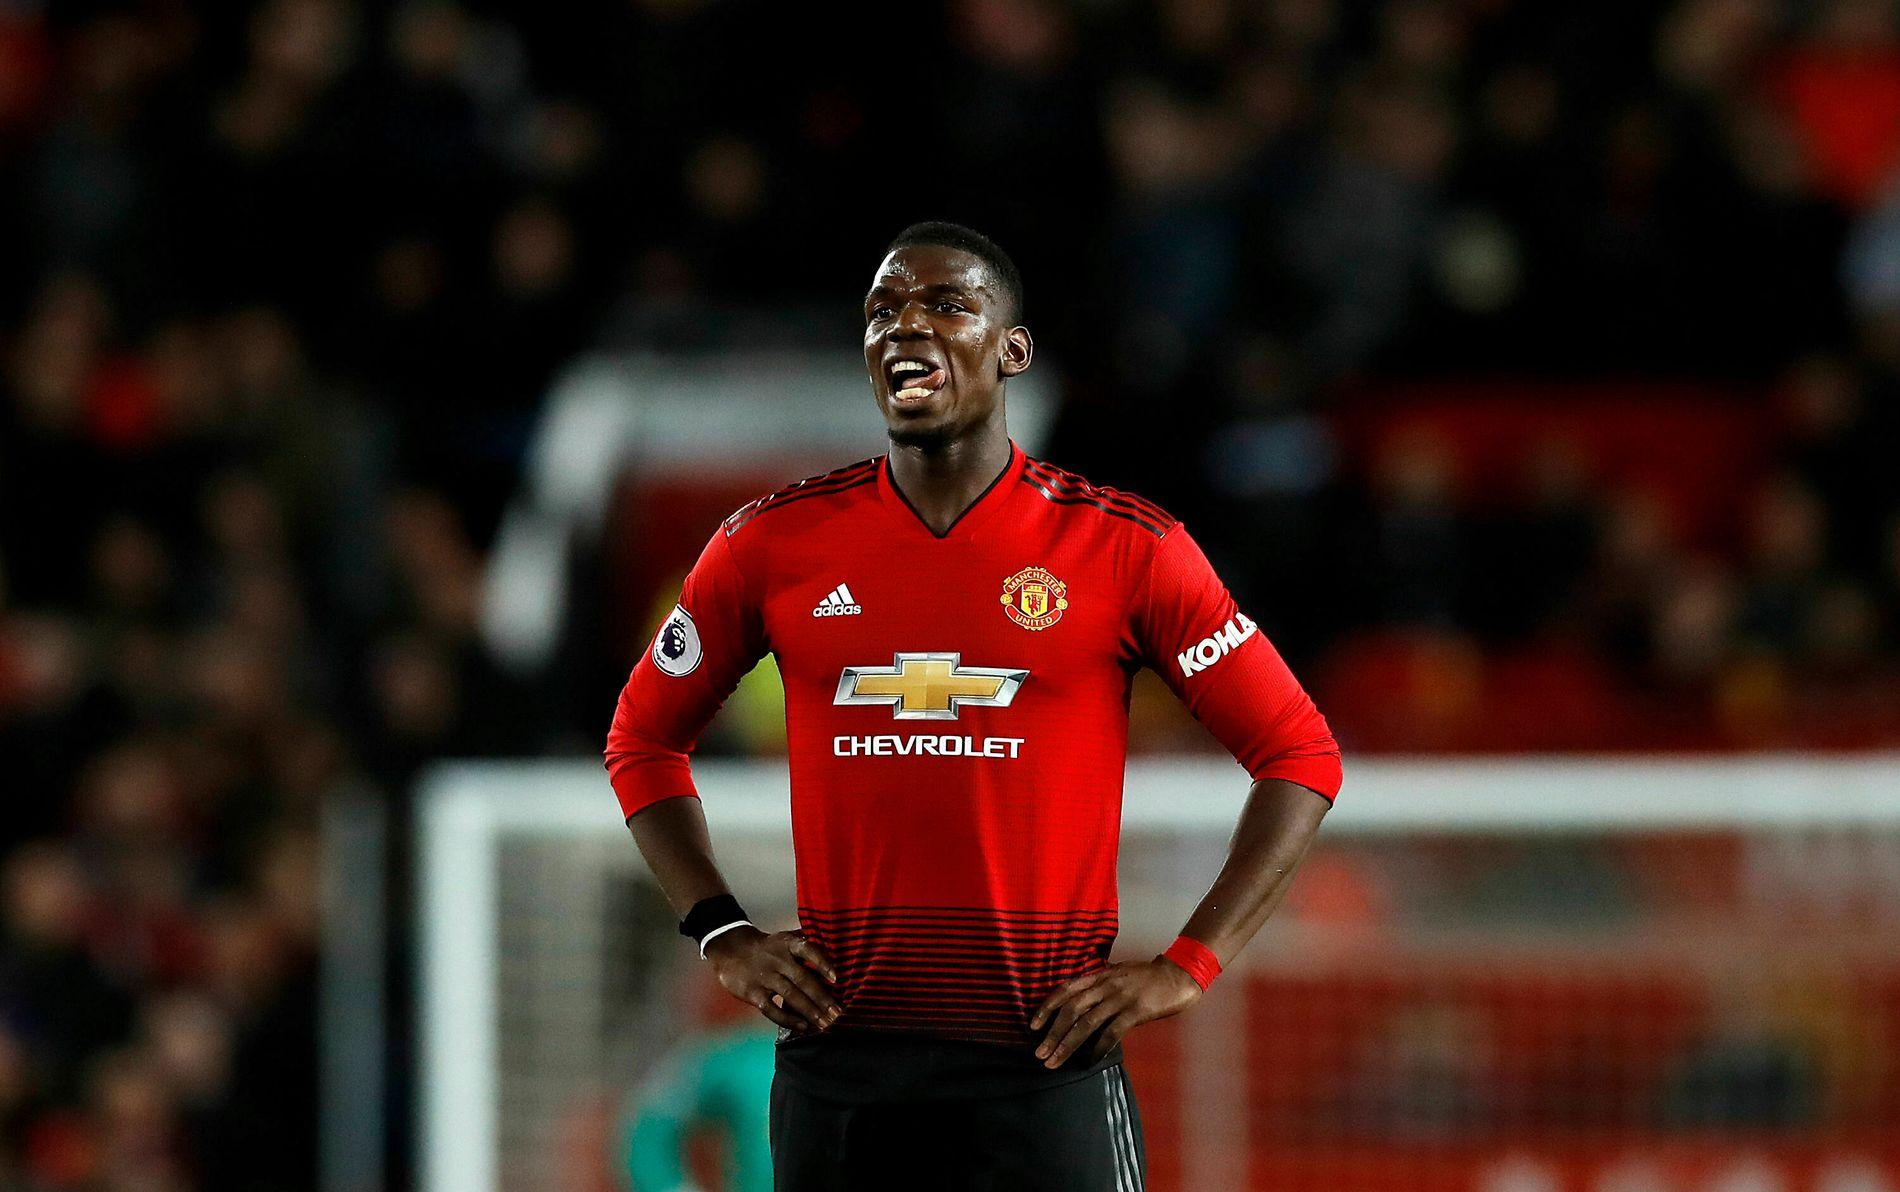 LEI: Paul Pogbas tid i Manchester United kan gå mot slutten.